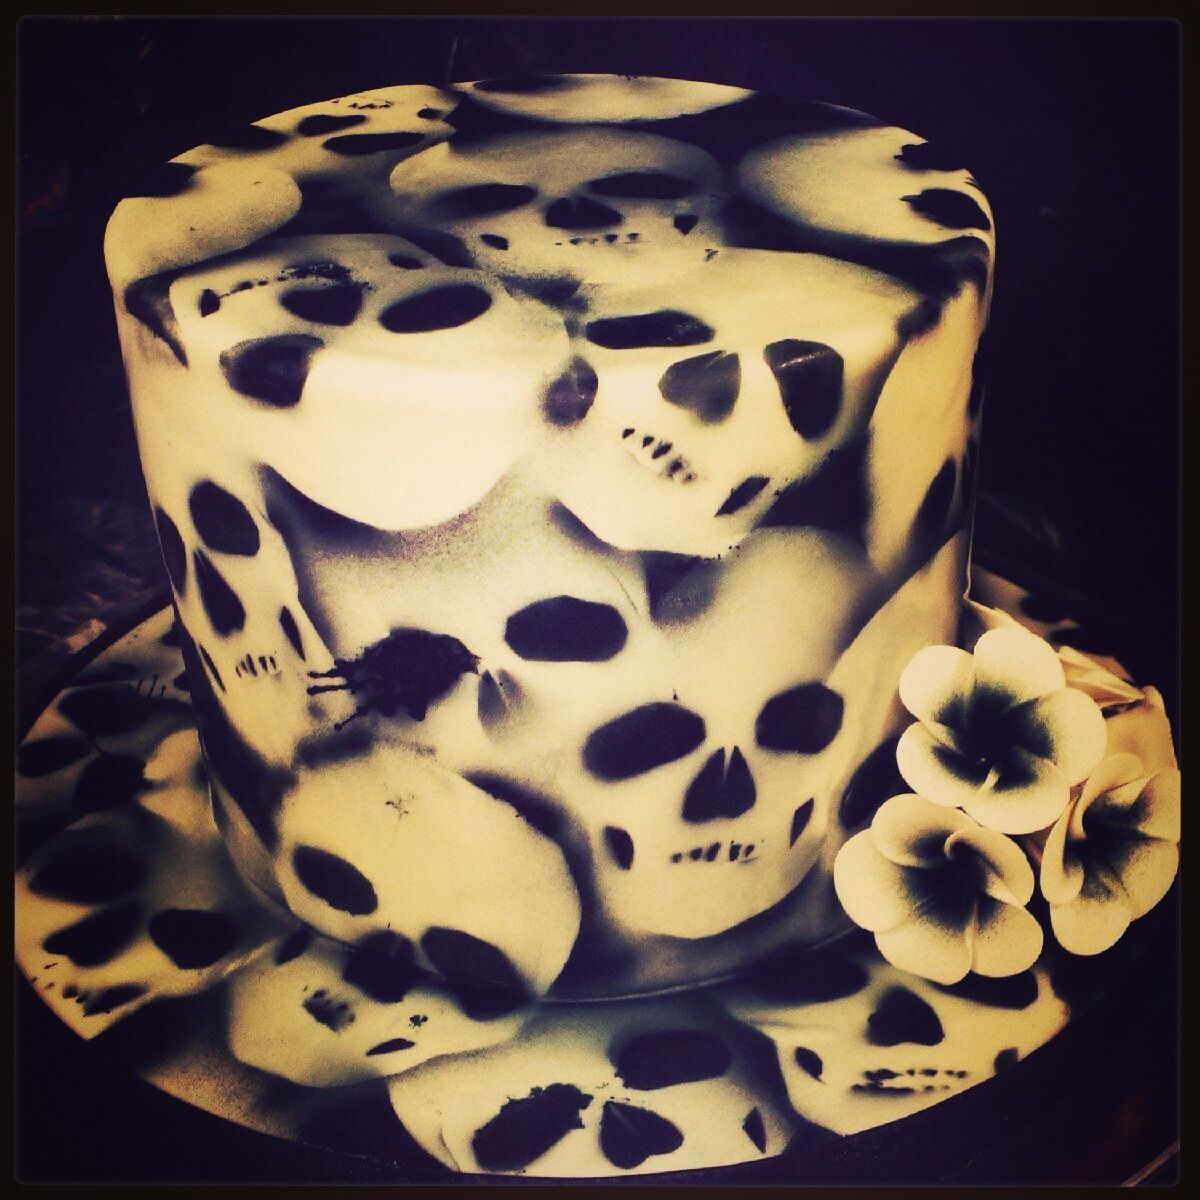 skull birthday cake pictures